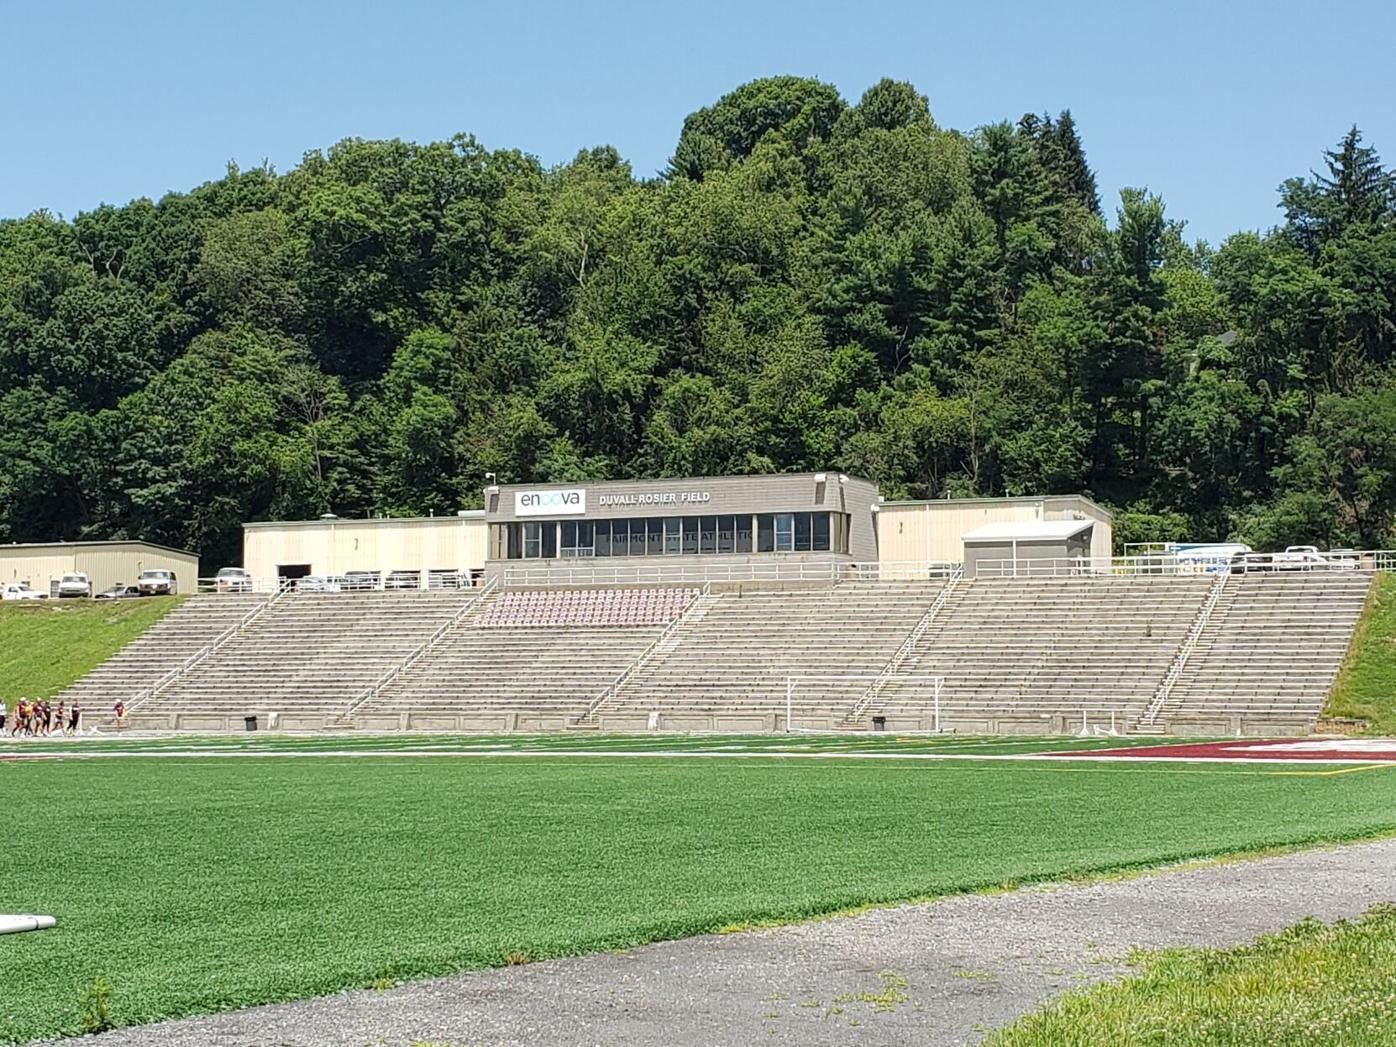 Duvall-Rosier Field